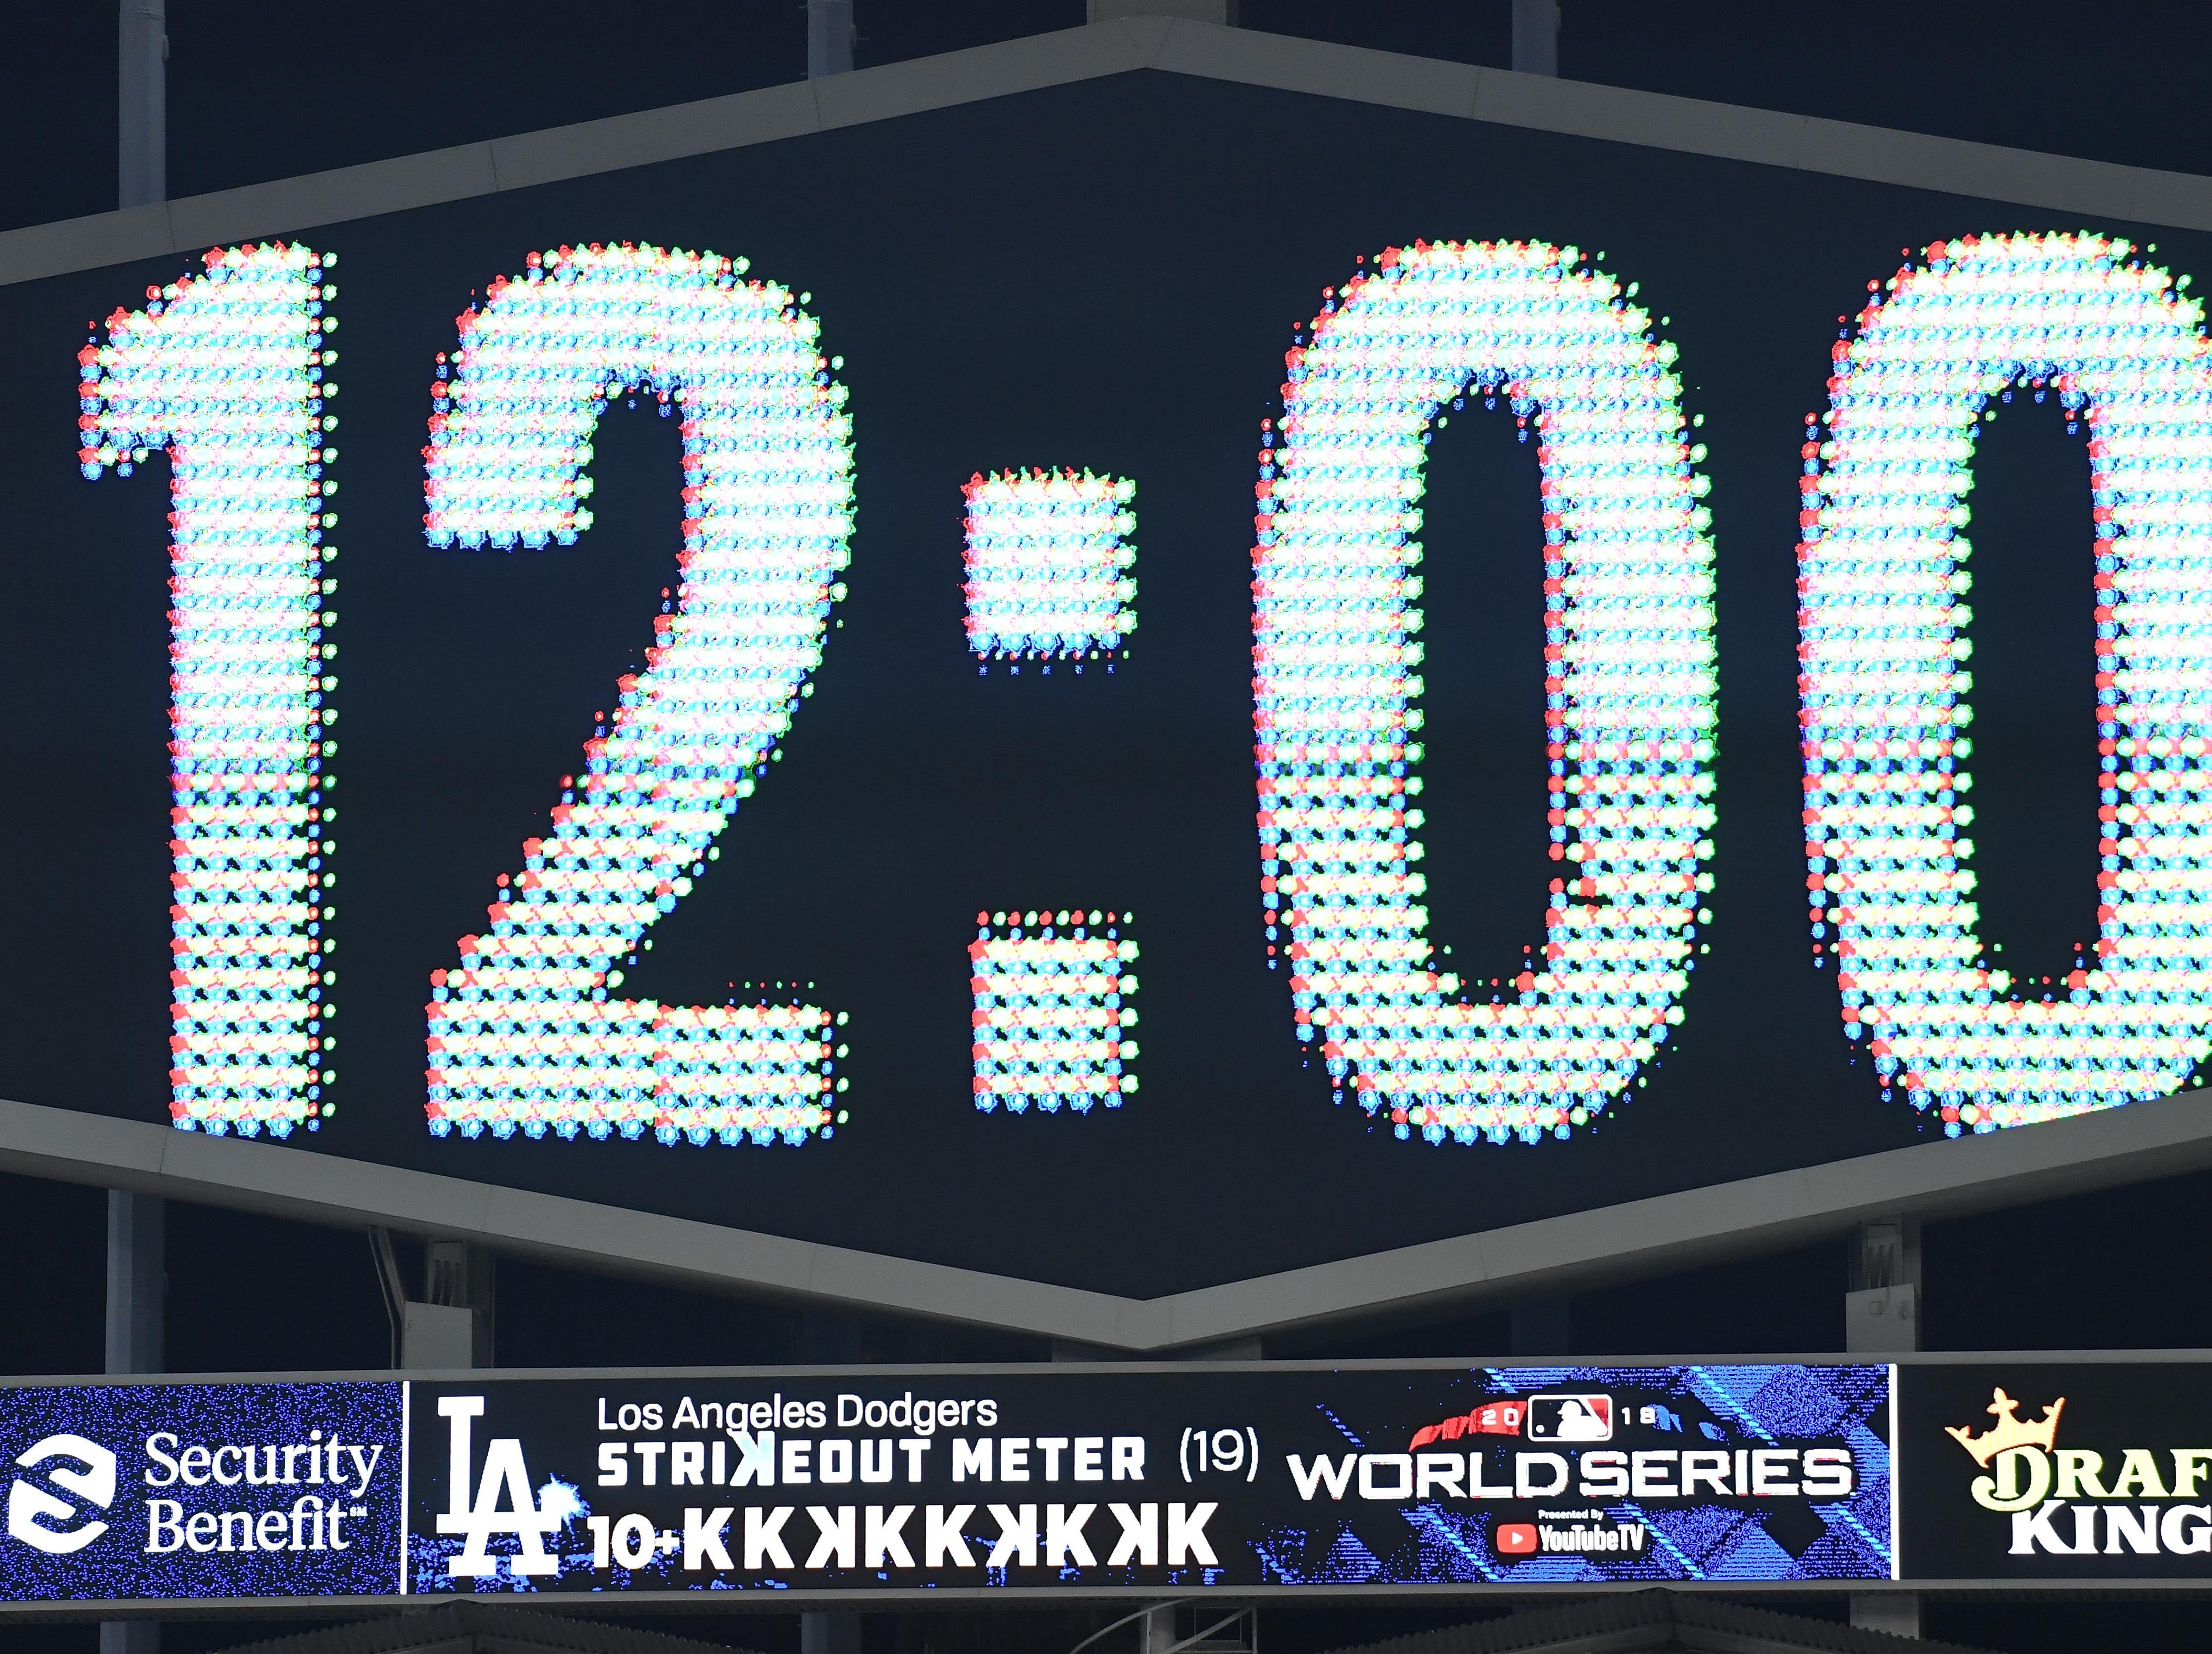 Game 3 at Dodger Stadium: The clock strikes midnight